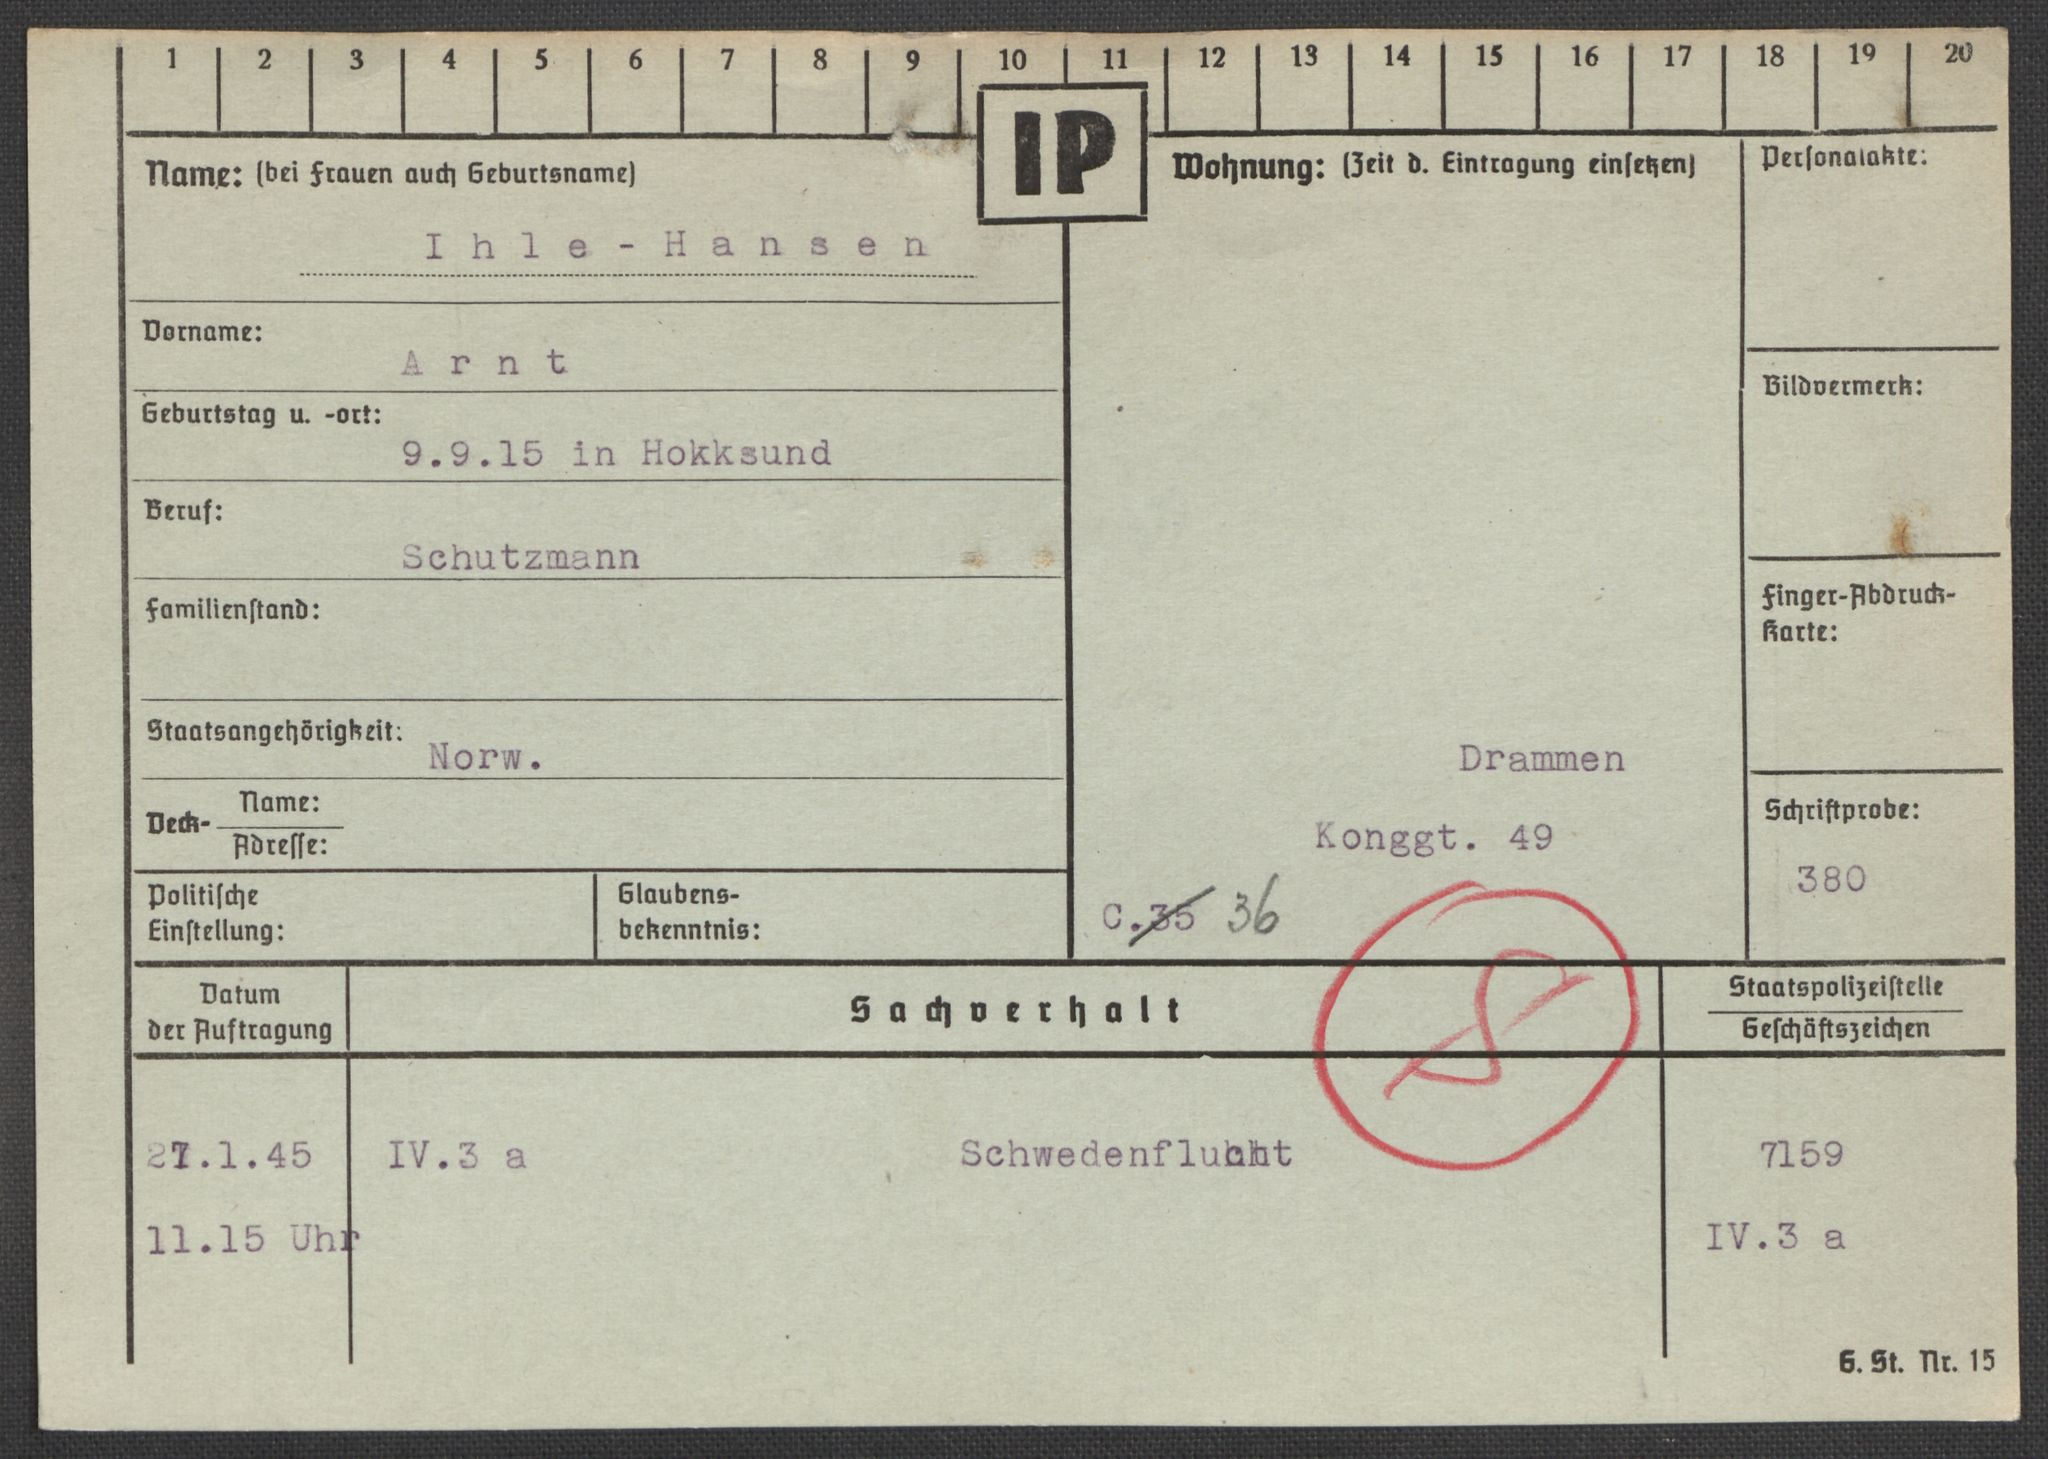 RA, Befehlshaber der Sicherheitspolizei und des SD, E/Ea/Eaa/L0005: Register over norske fanger i Møllergata 19: Hø-Kj, 1940-1945, s. 114